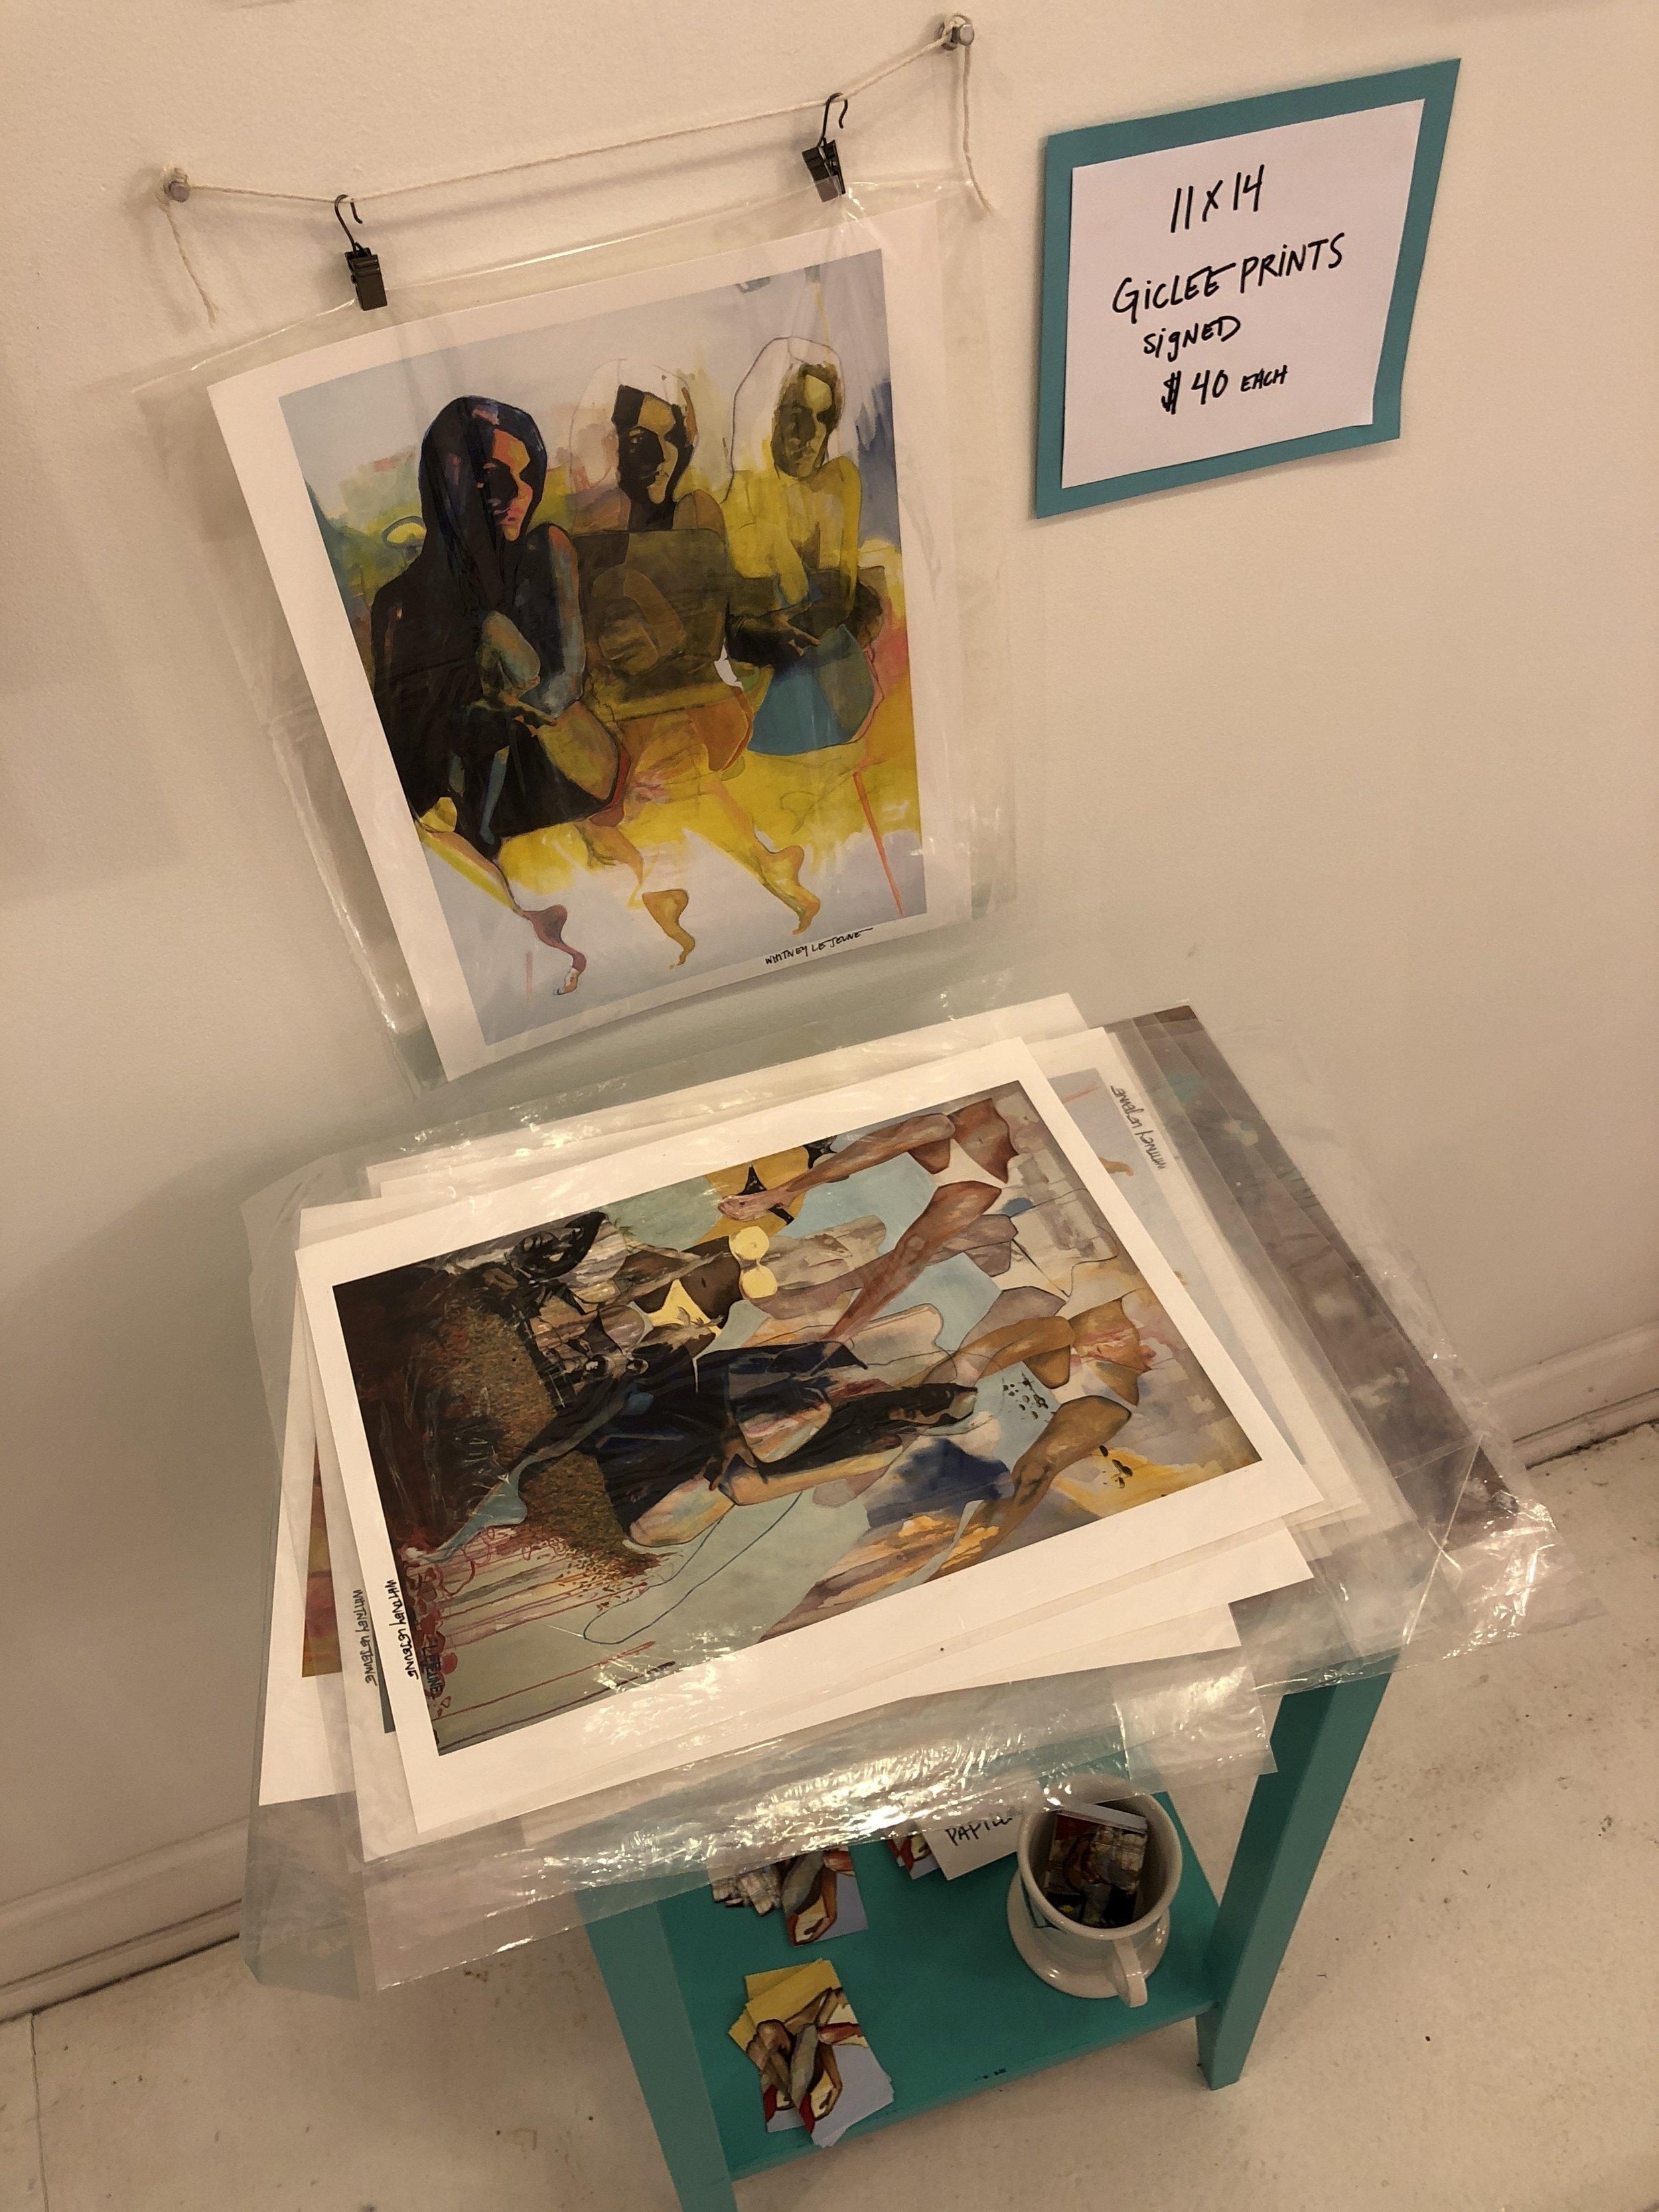 Prints by Witney Lejeune